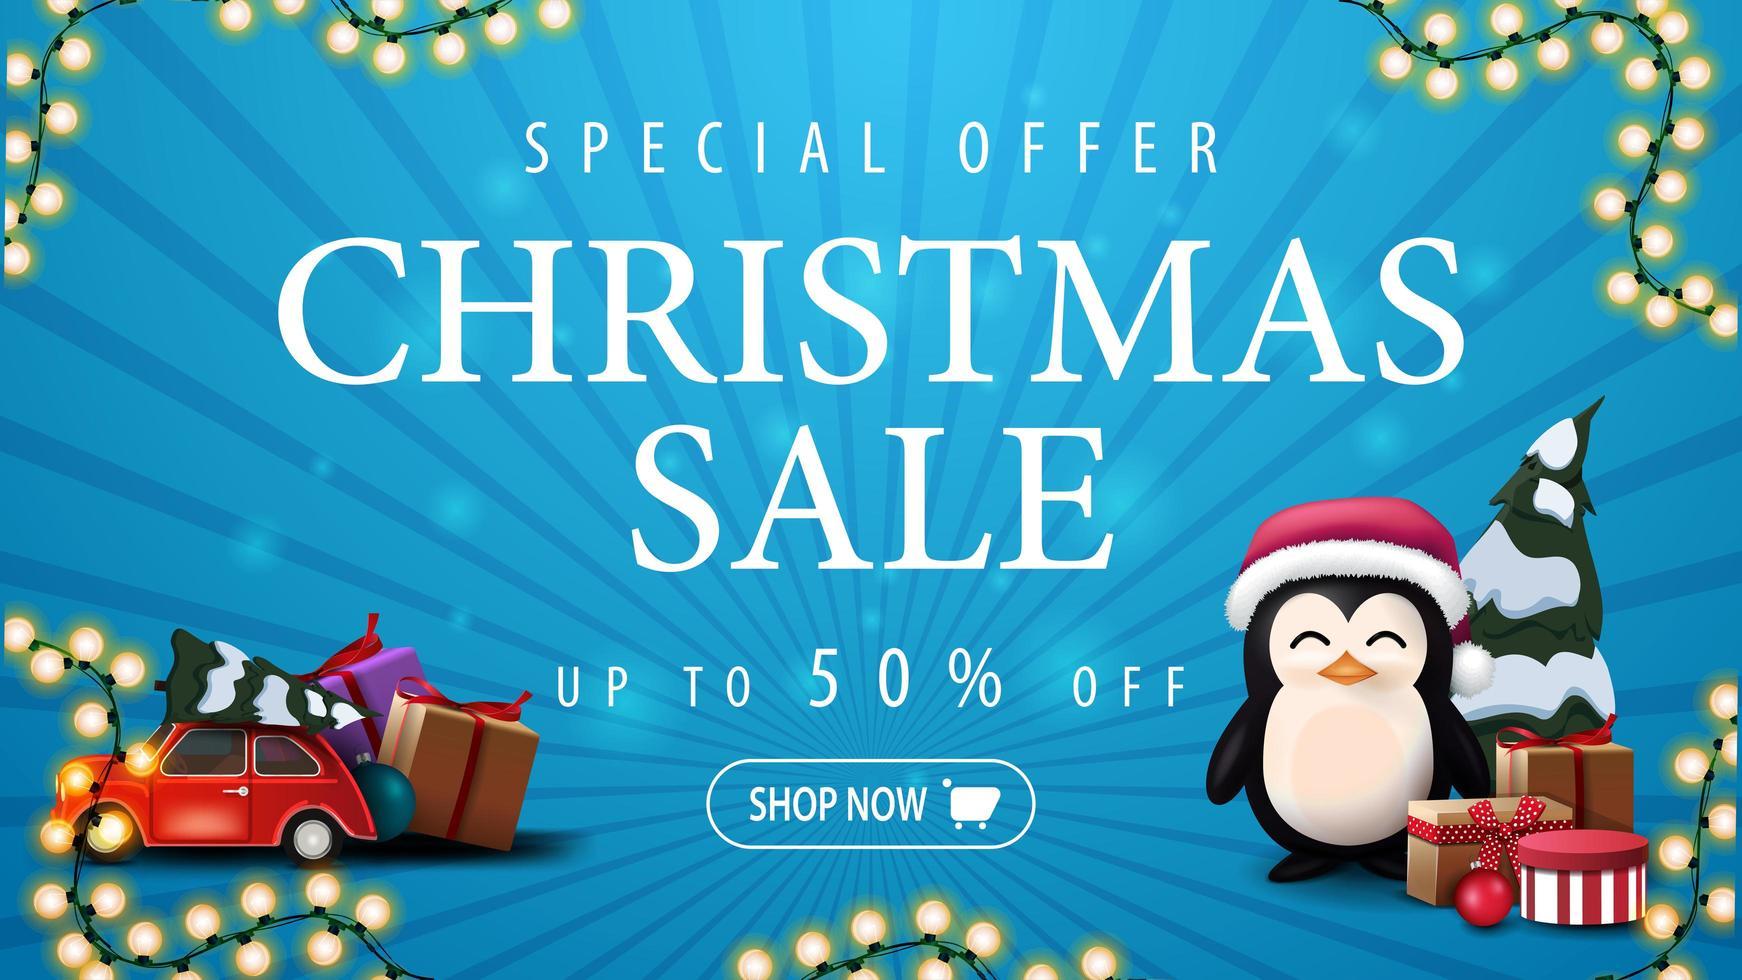 speciale aanbieding, kerstuitverkoop, tot 50 korting, blauwe kortingsbanner met slinger, rode vintage auto met kerstboom en pinguïn in kerstmuts met cadeautjes vector